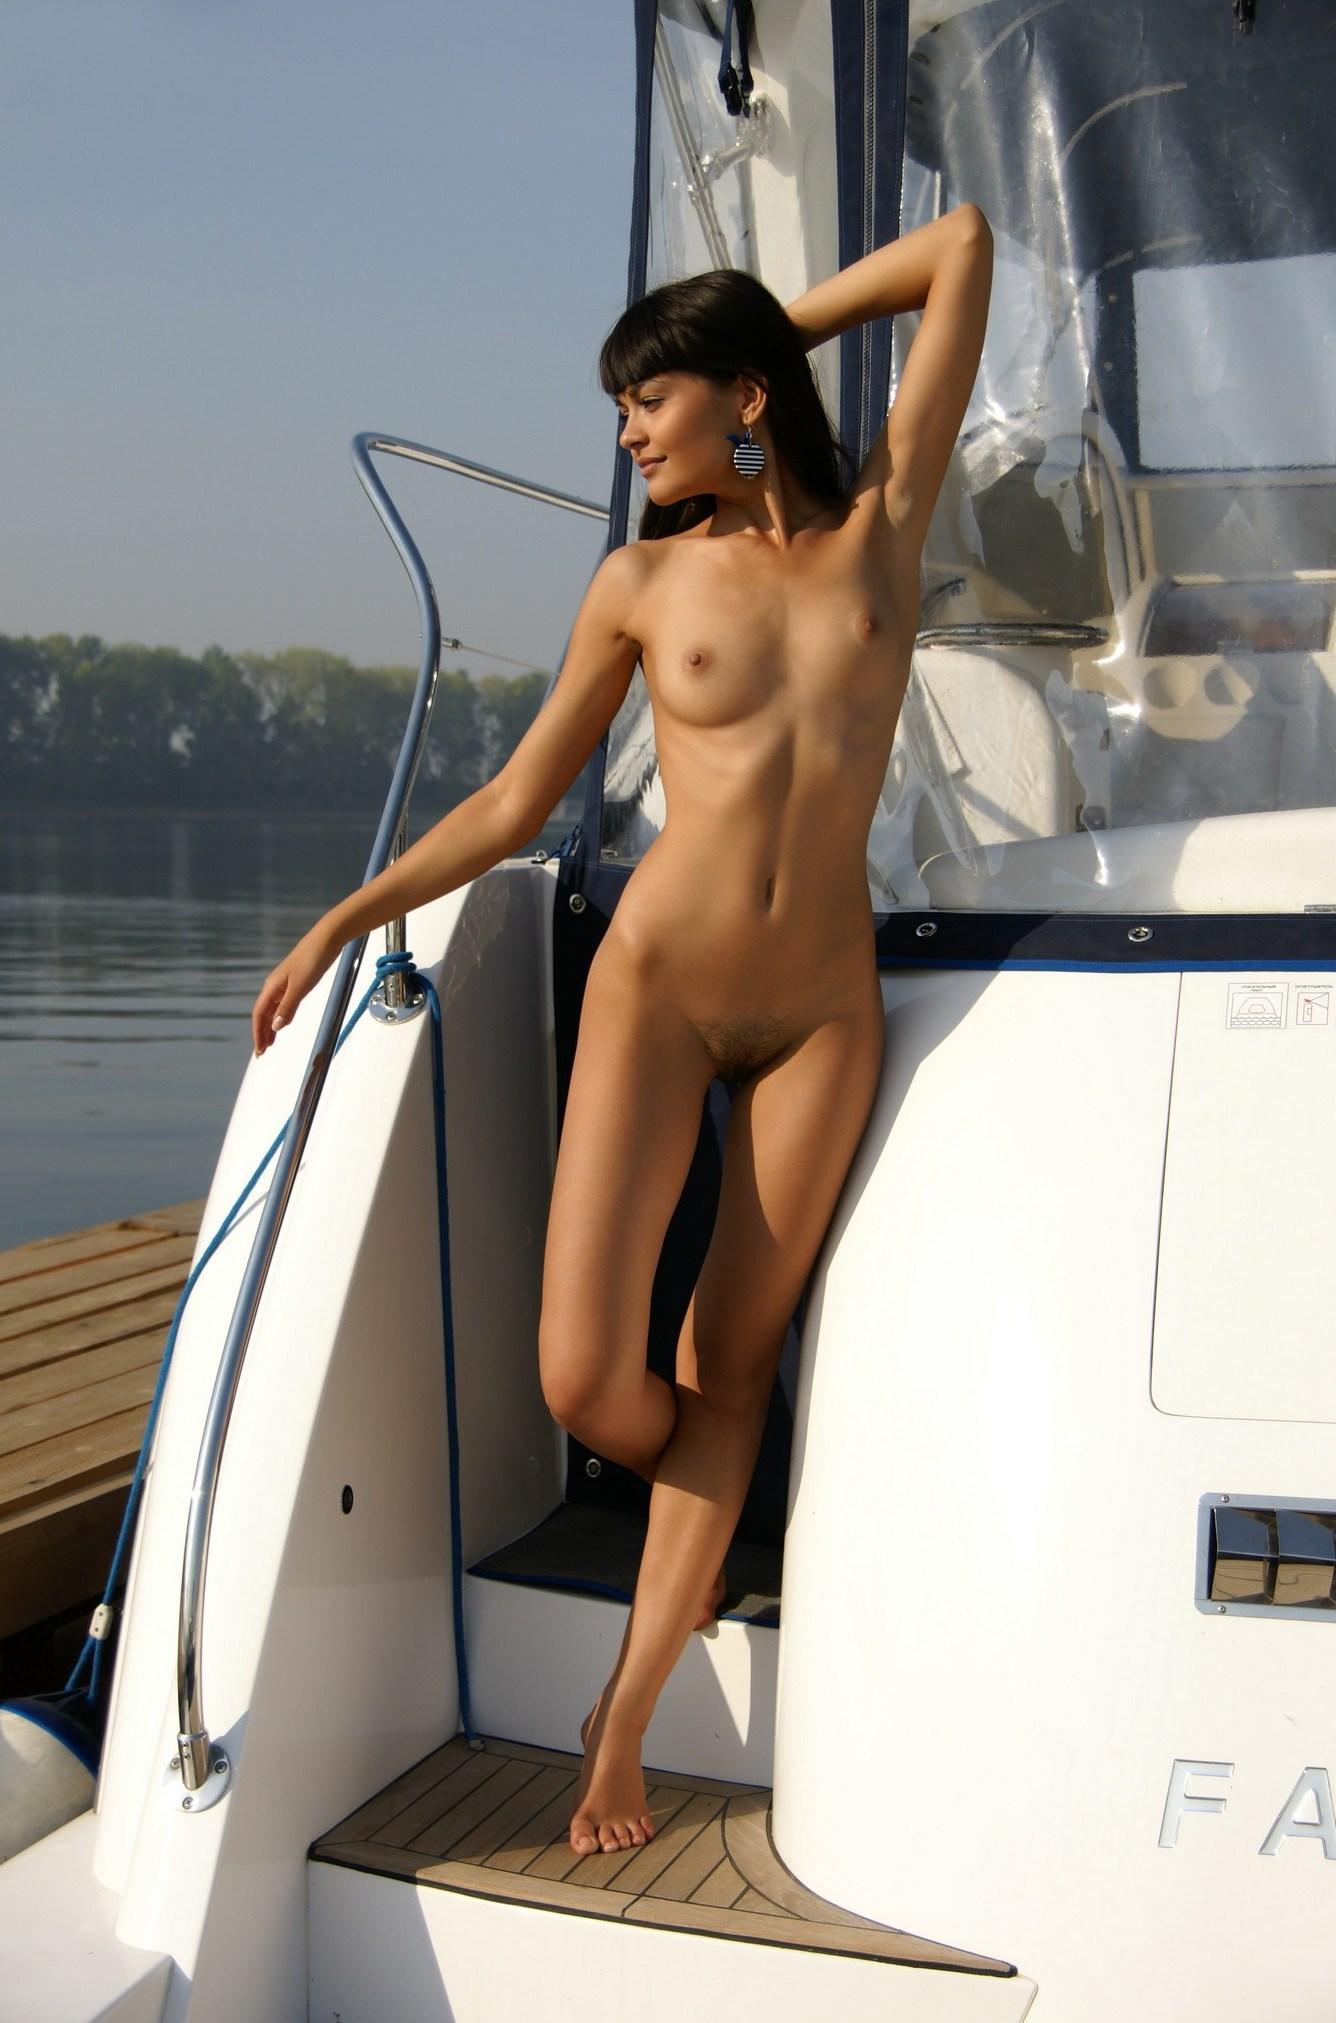 shaved-landysh-a-with-beautiful-brown-eyes-from-met-art-wearing-minidress-8.jpg